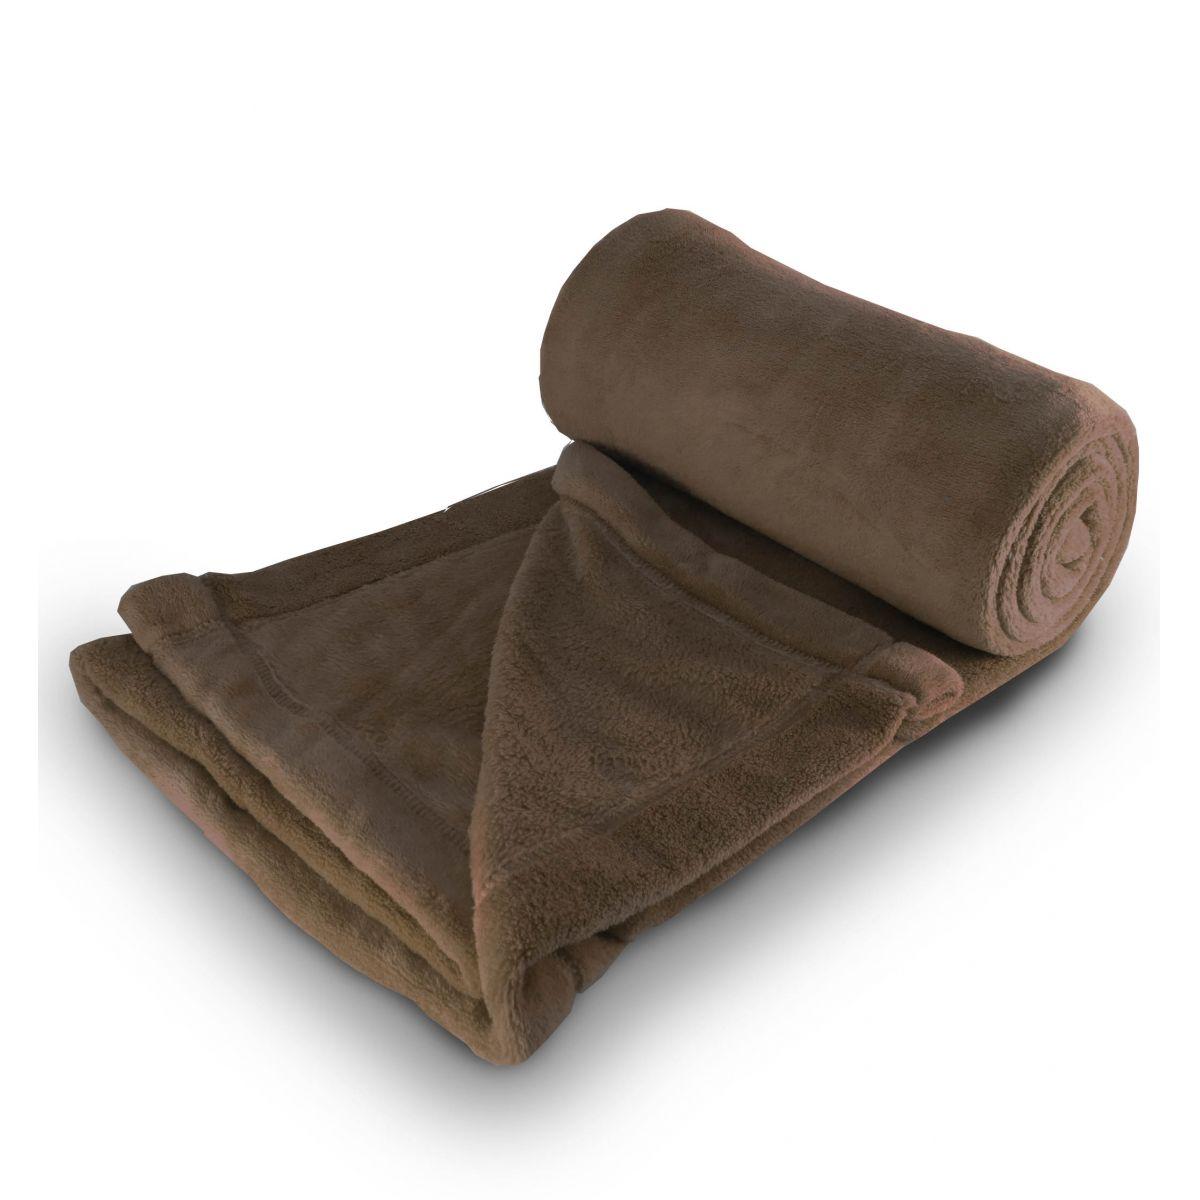 Cobertor de Microfibra 240 g/m³ Casal - Bege